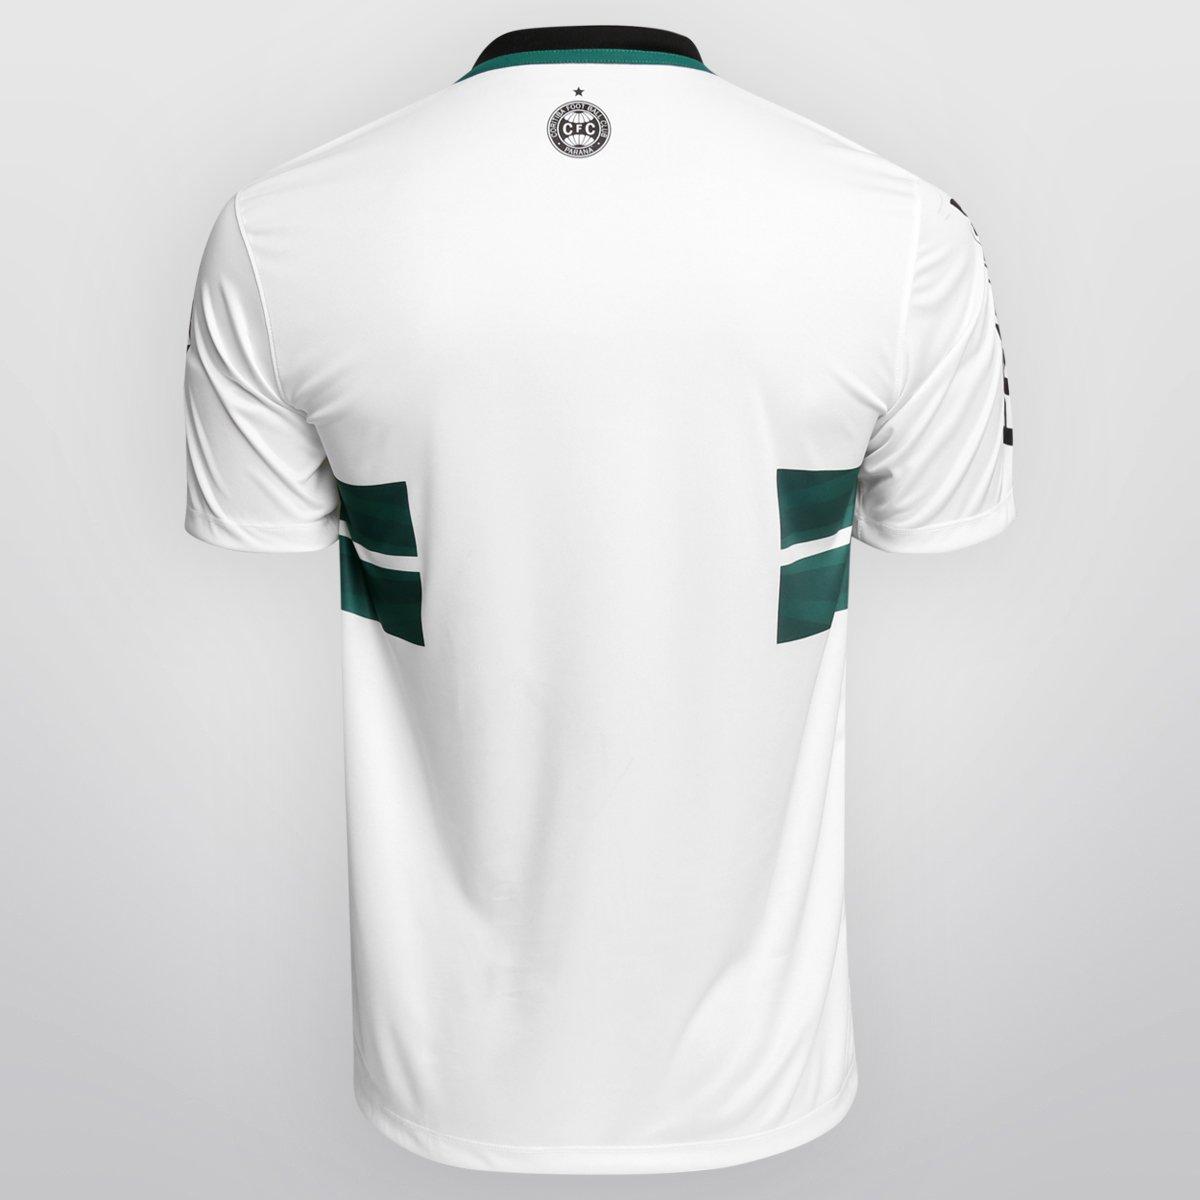 Camisa Coritiba I 2015 s nº Torcedor Nike Masculina - Compre Agora ... e2aeddad0c3e2